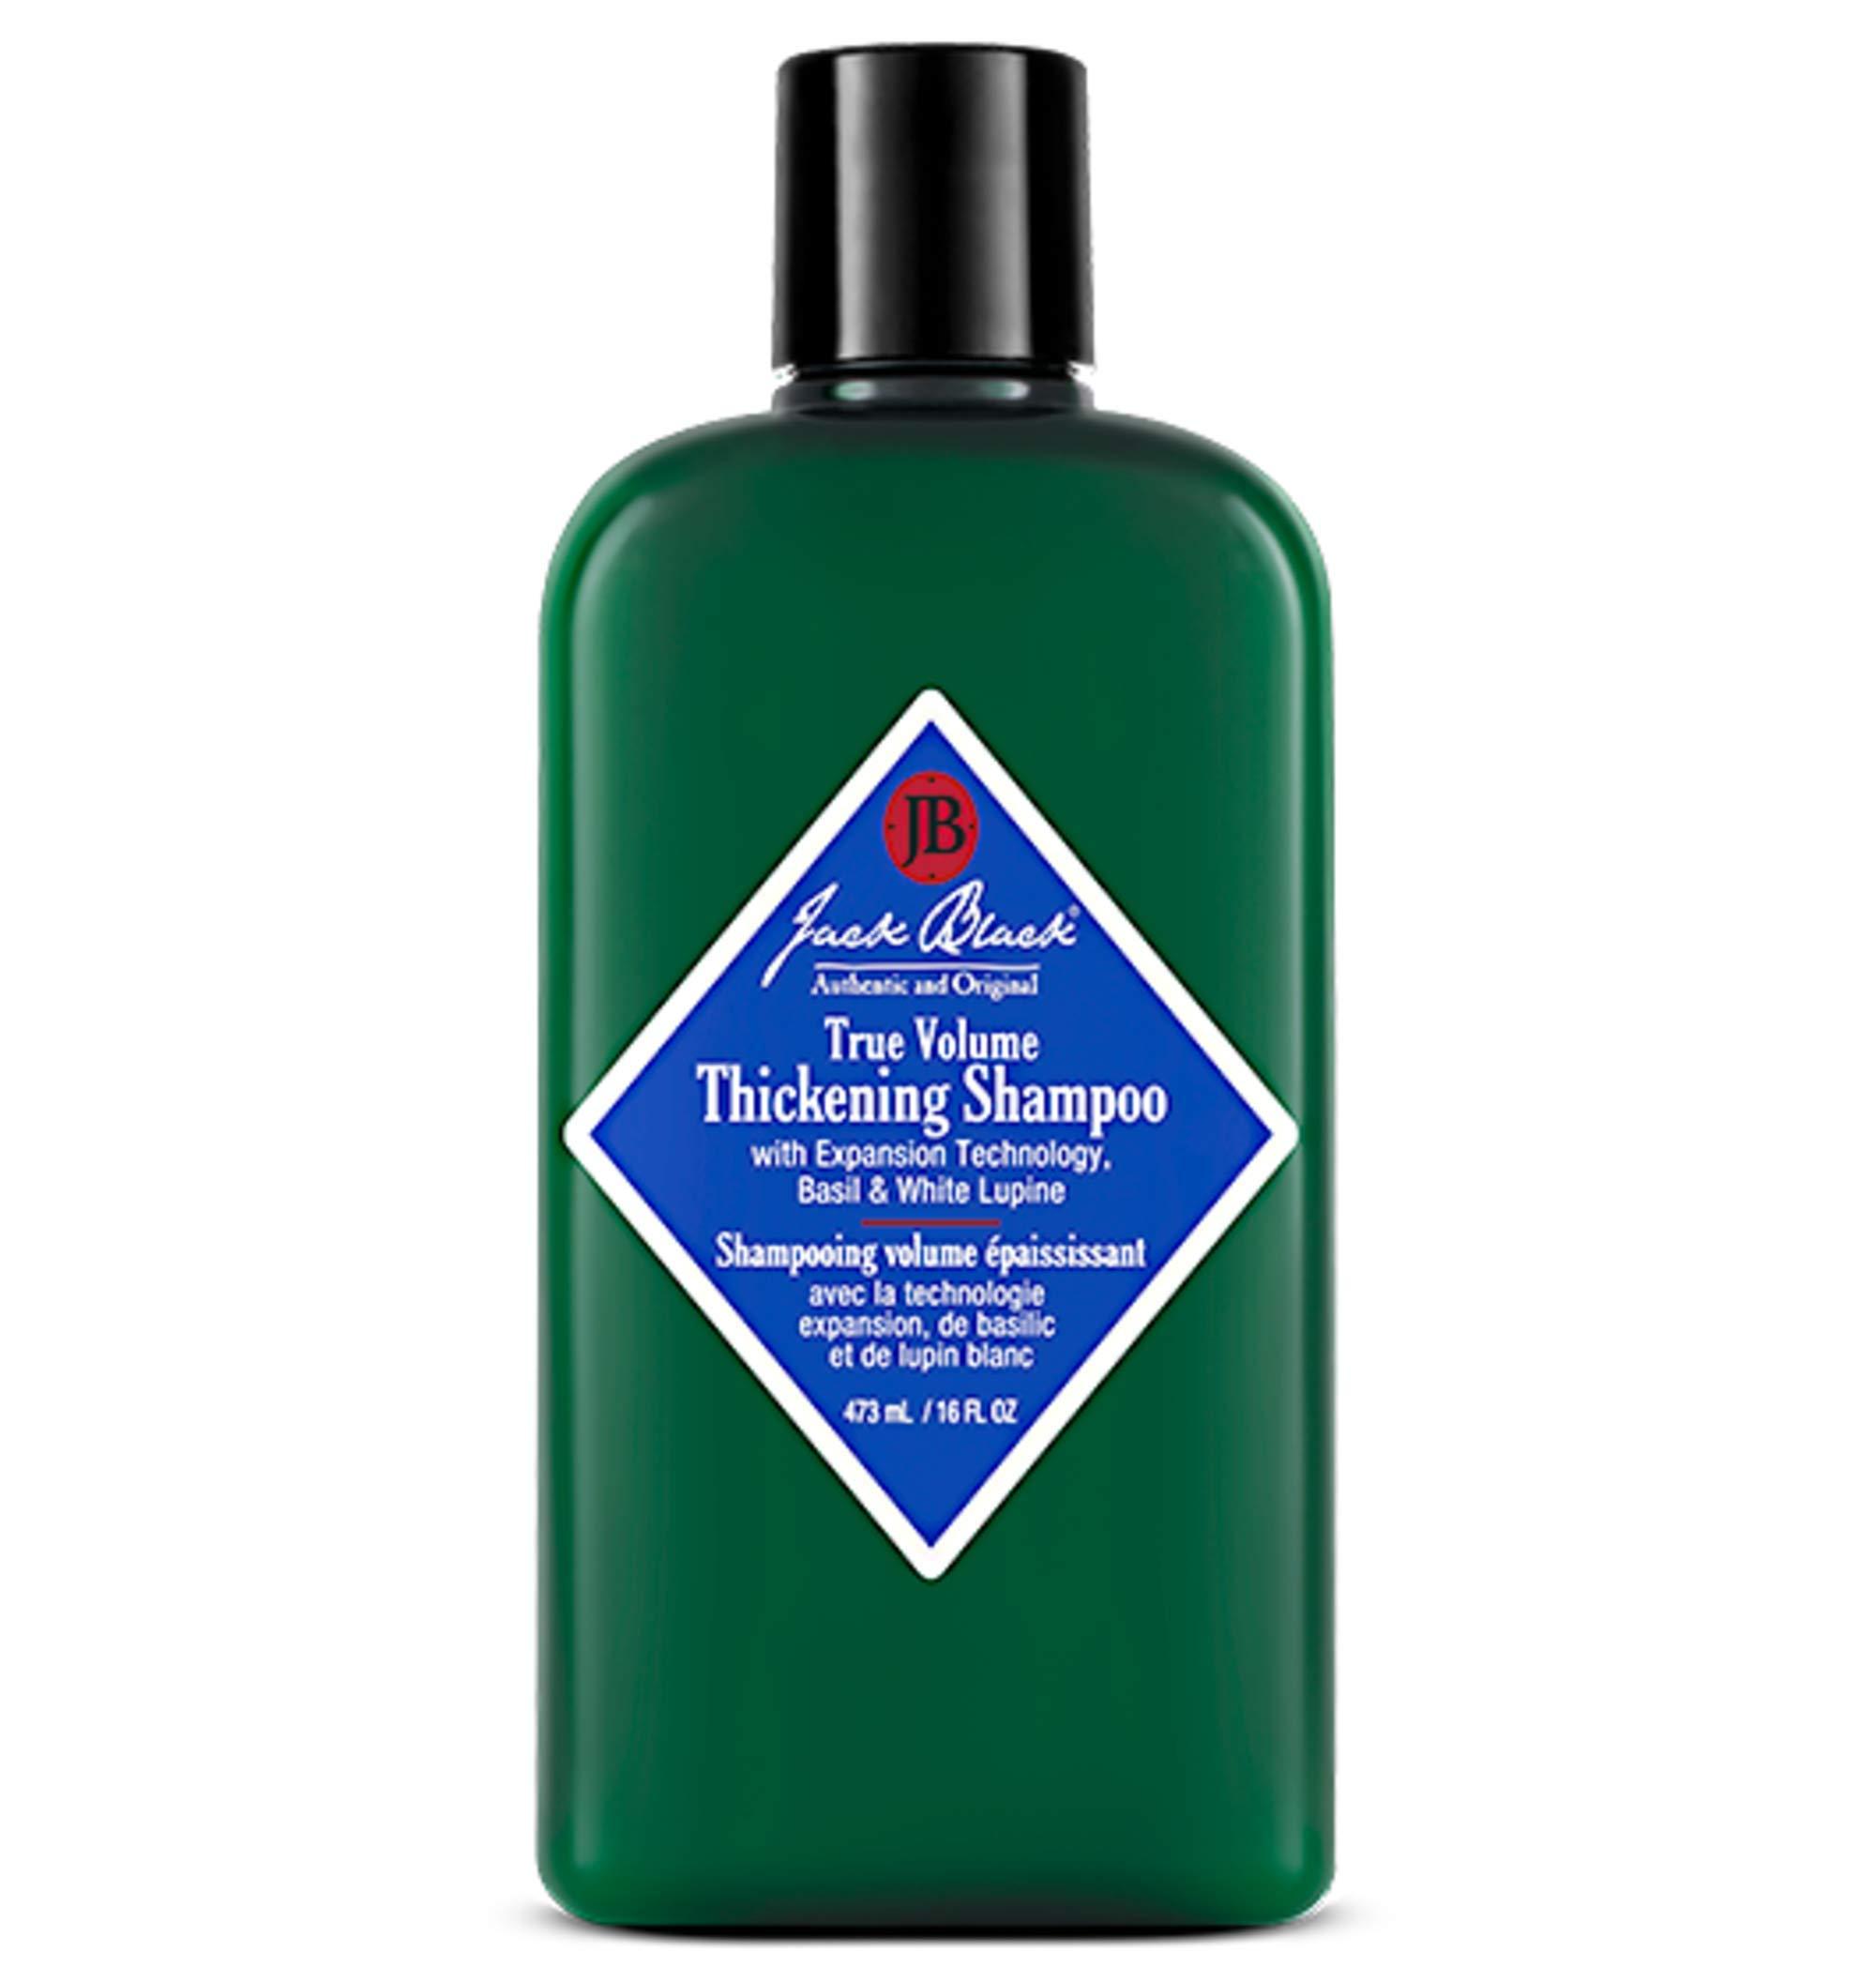 Jack Black True Volume Thickening Shampoo 473 ml